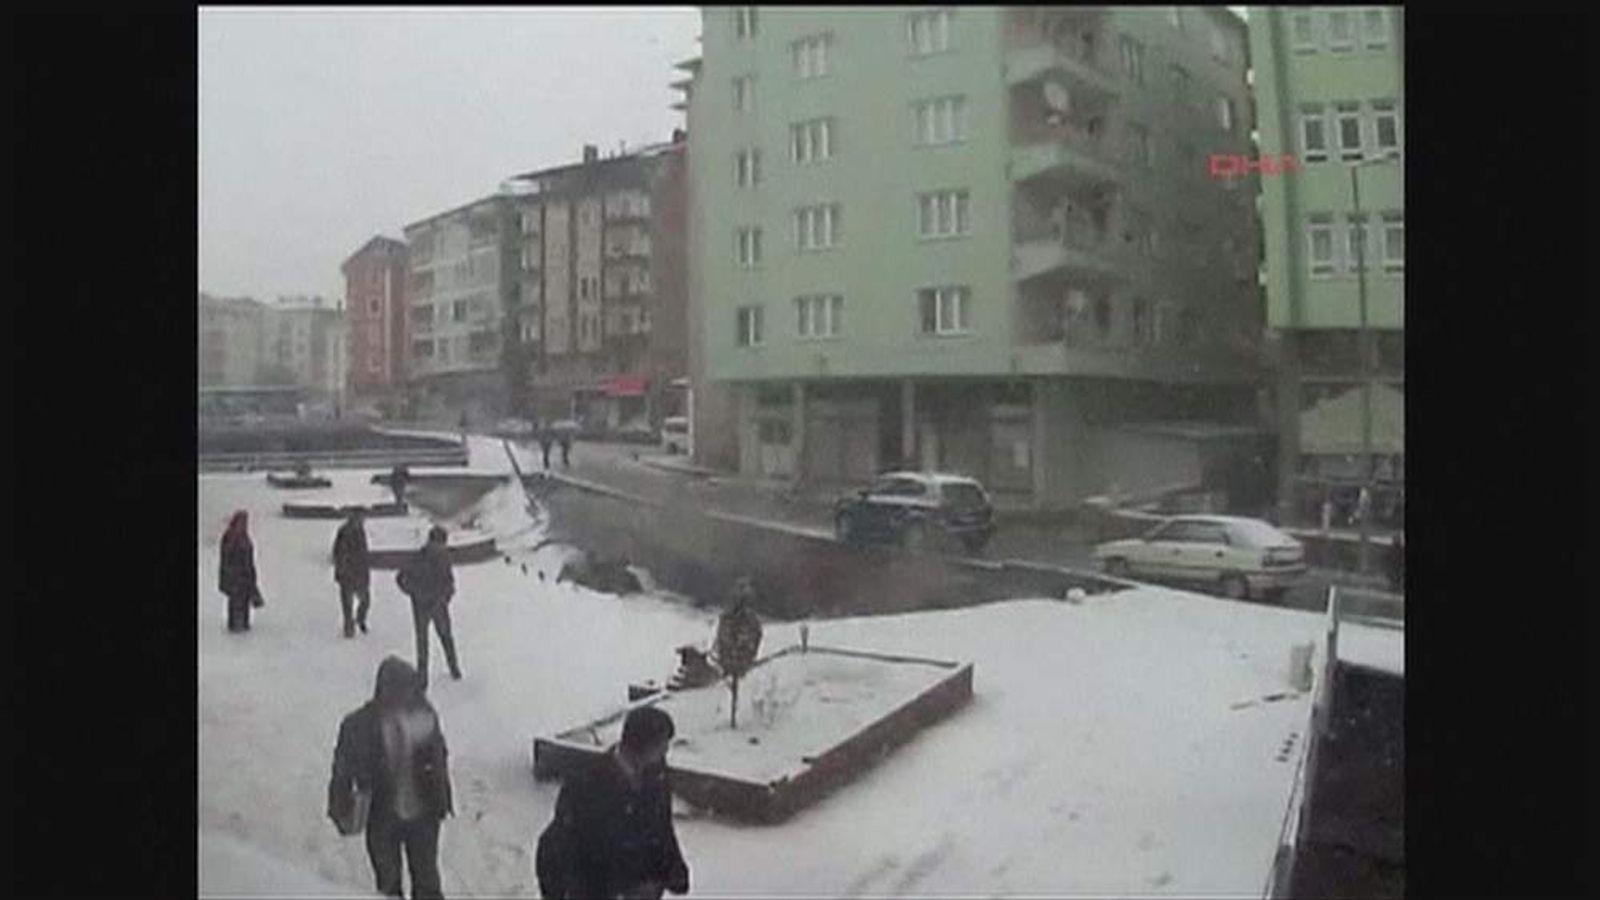 Pavement collapse in Turkey